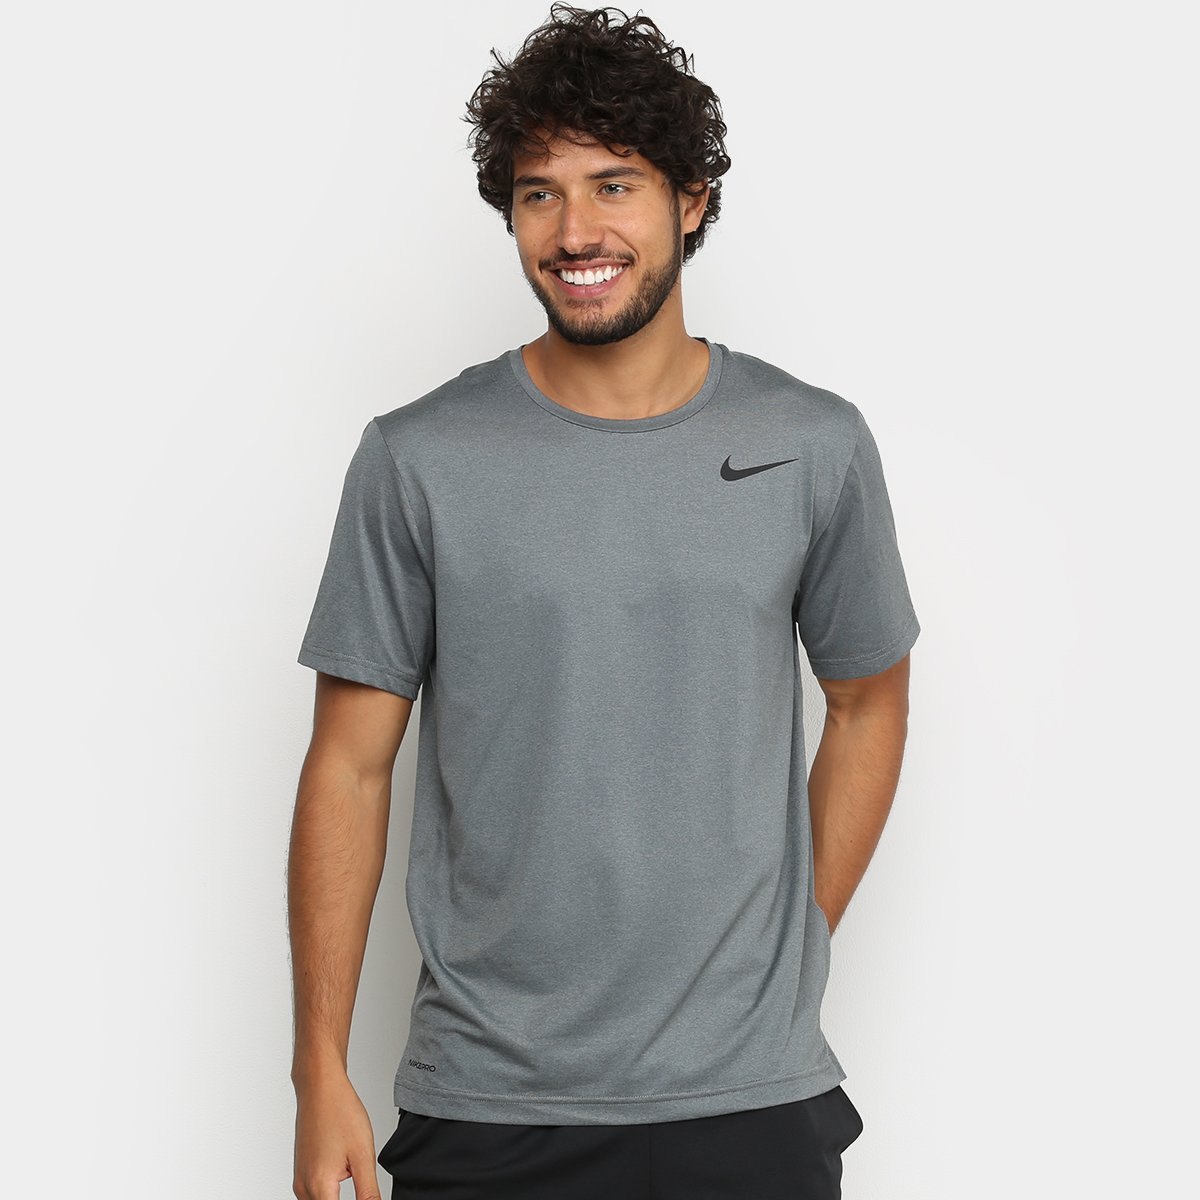 triste Para aumentar Error  Camiseta Nike Pro Top Dri-Fit Masculina - Preto e Cinza | Netshoes